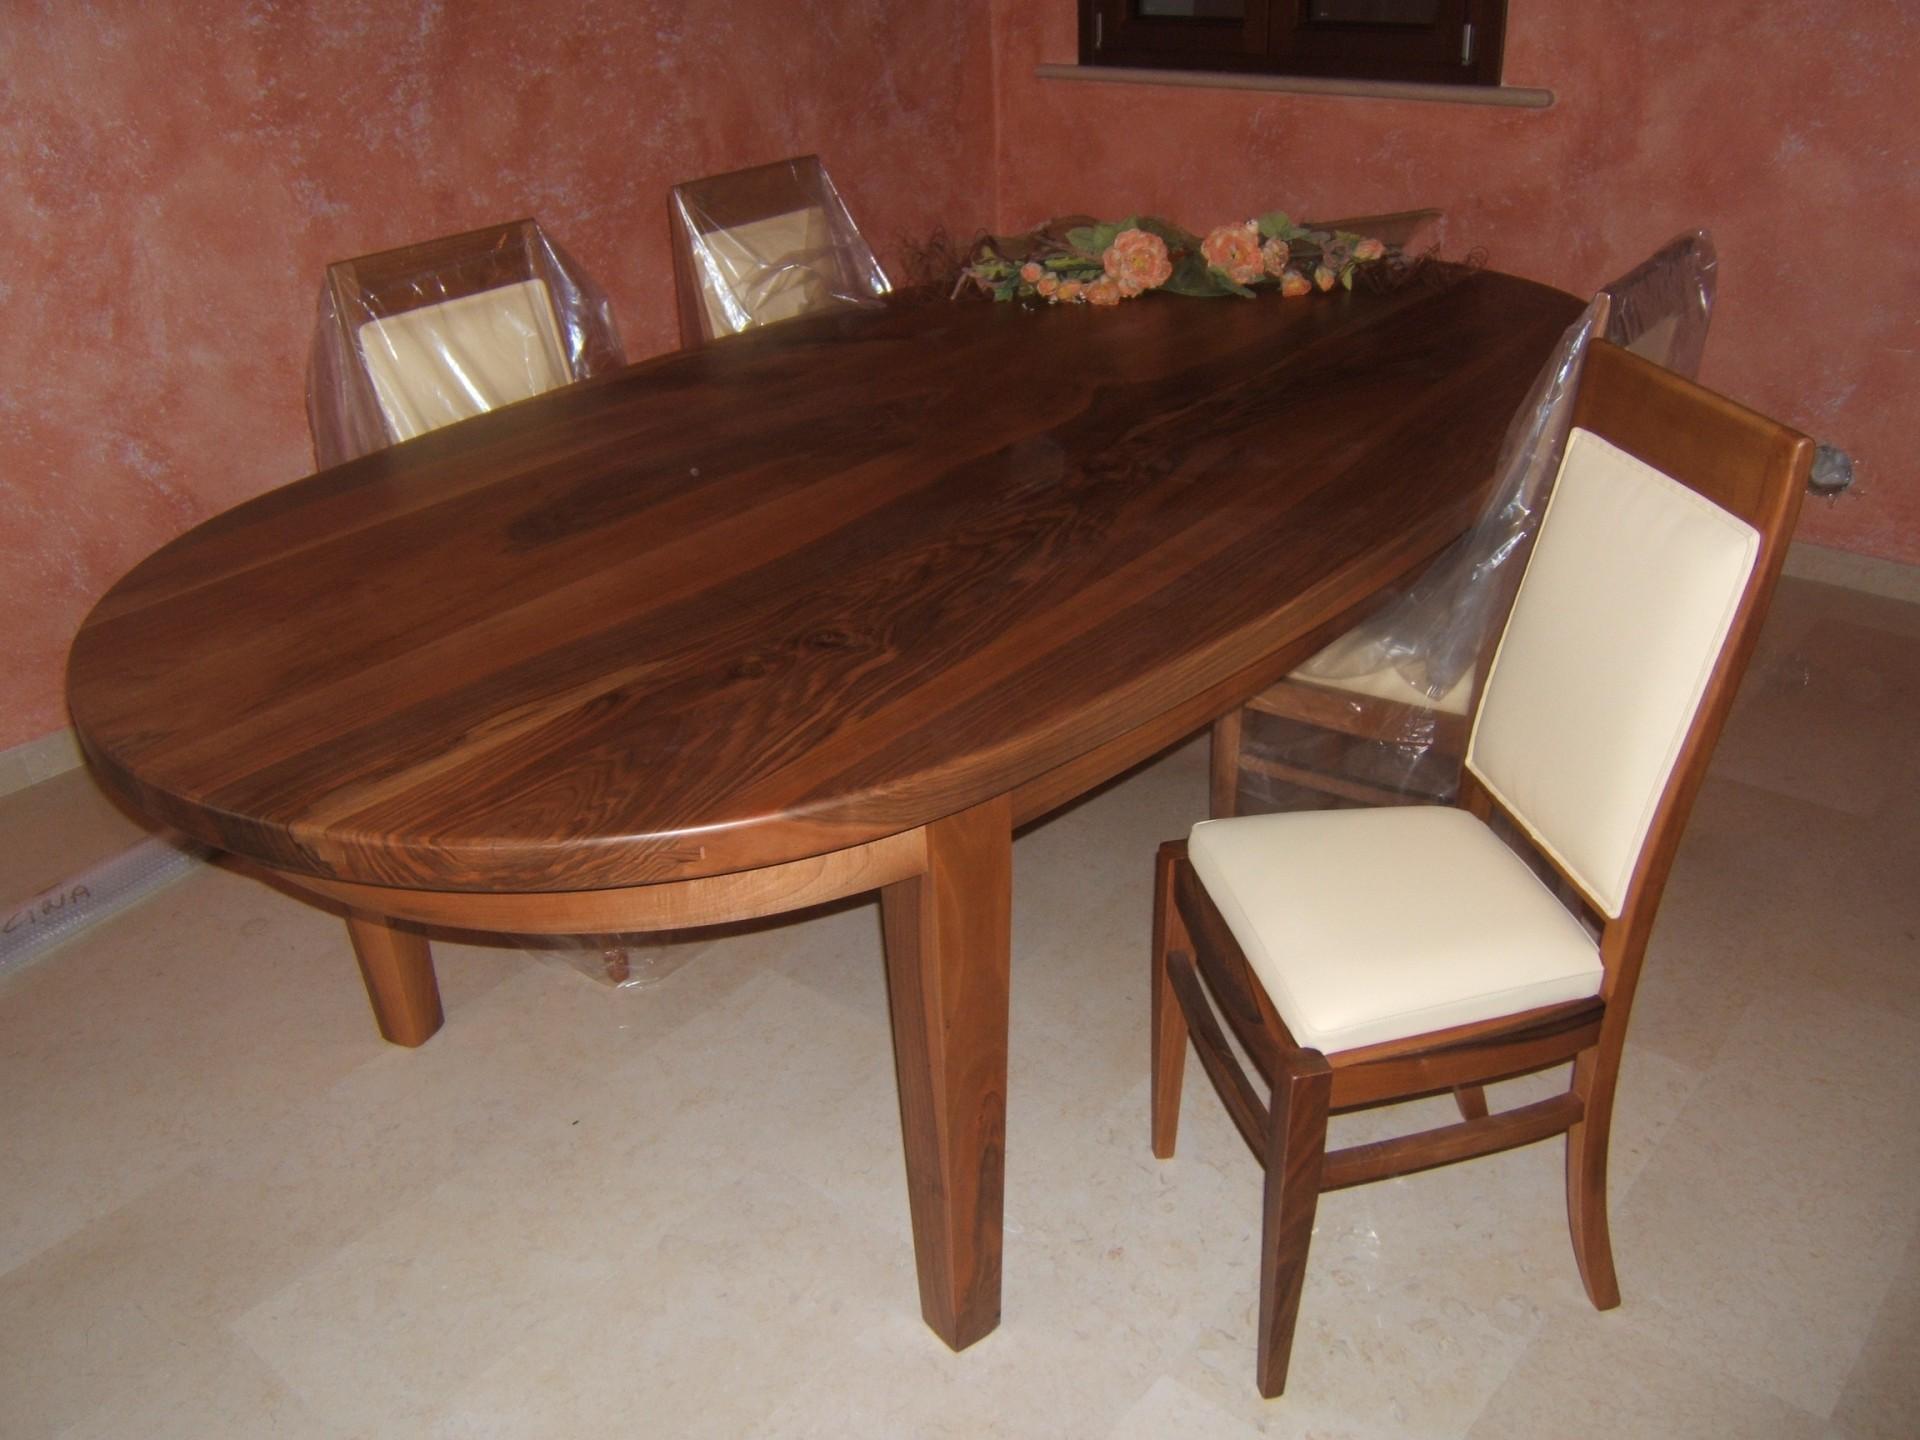 Arredamento in legno naturale accessori cucina rustica for Arredamento legno naturale